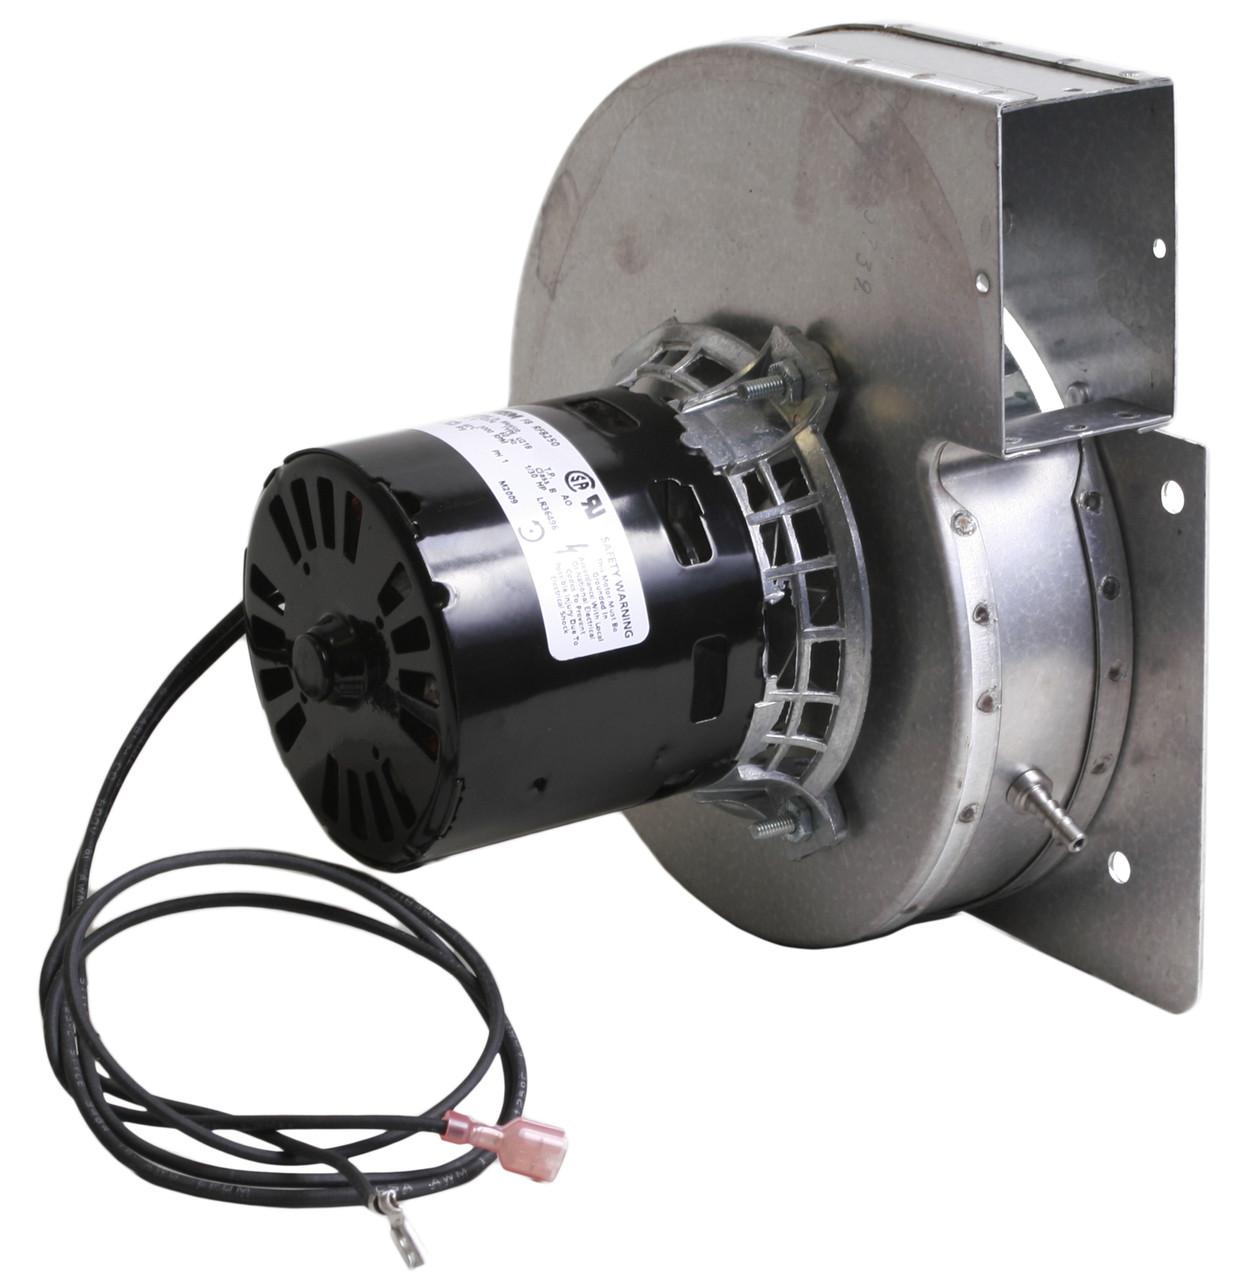 lennox furnace blower motor wiring armstrong furnace draft inducer 208 230v 42250 001 fb century furnace blower motor wiring